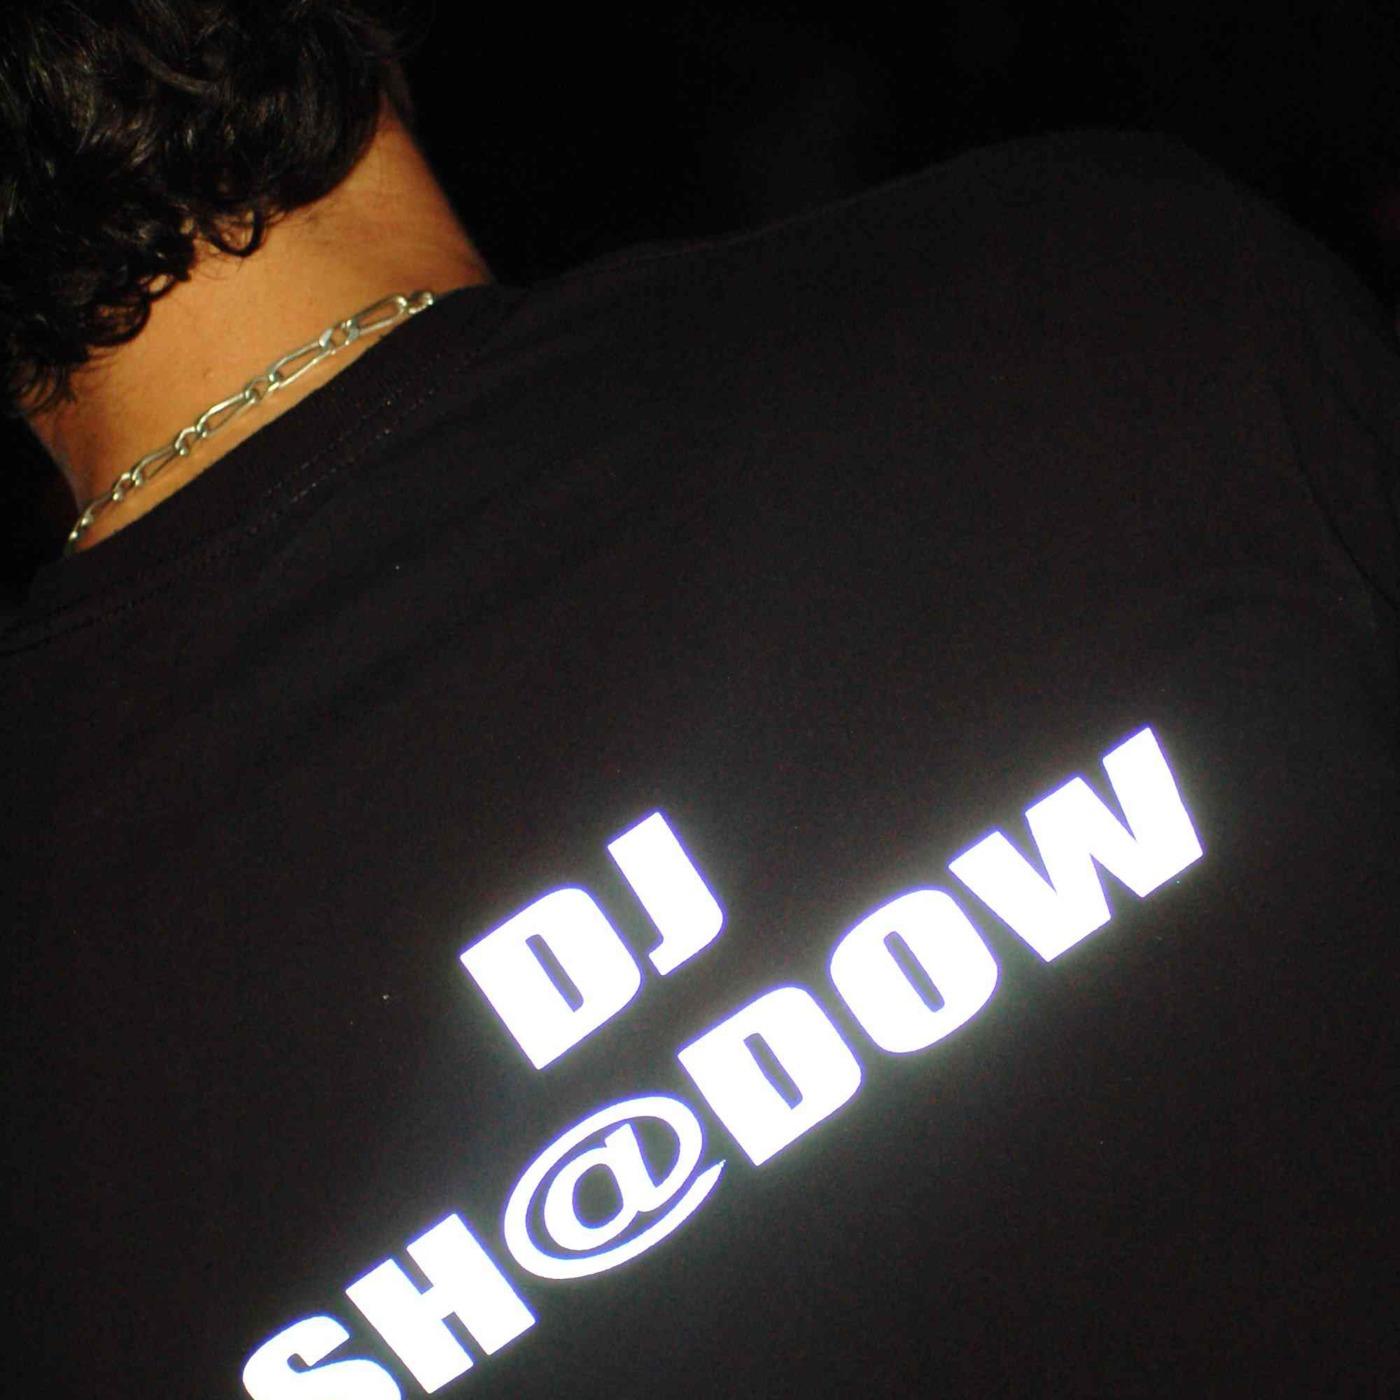 djsh@dow nushock set